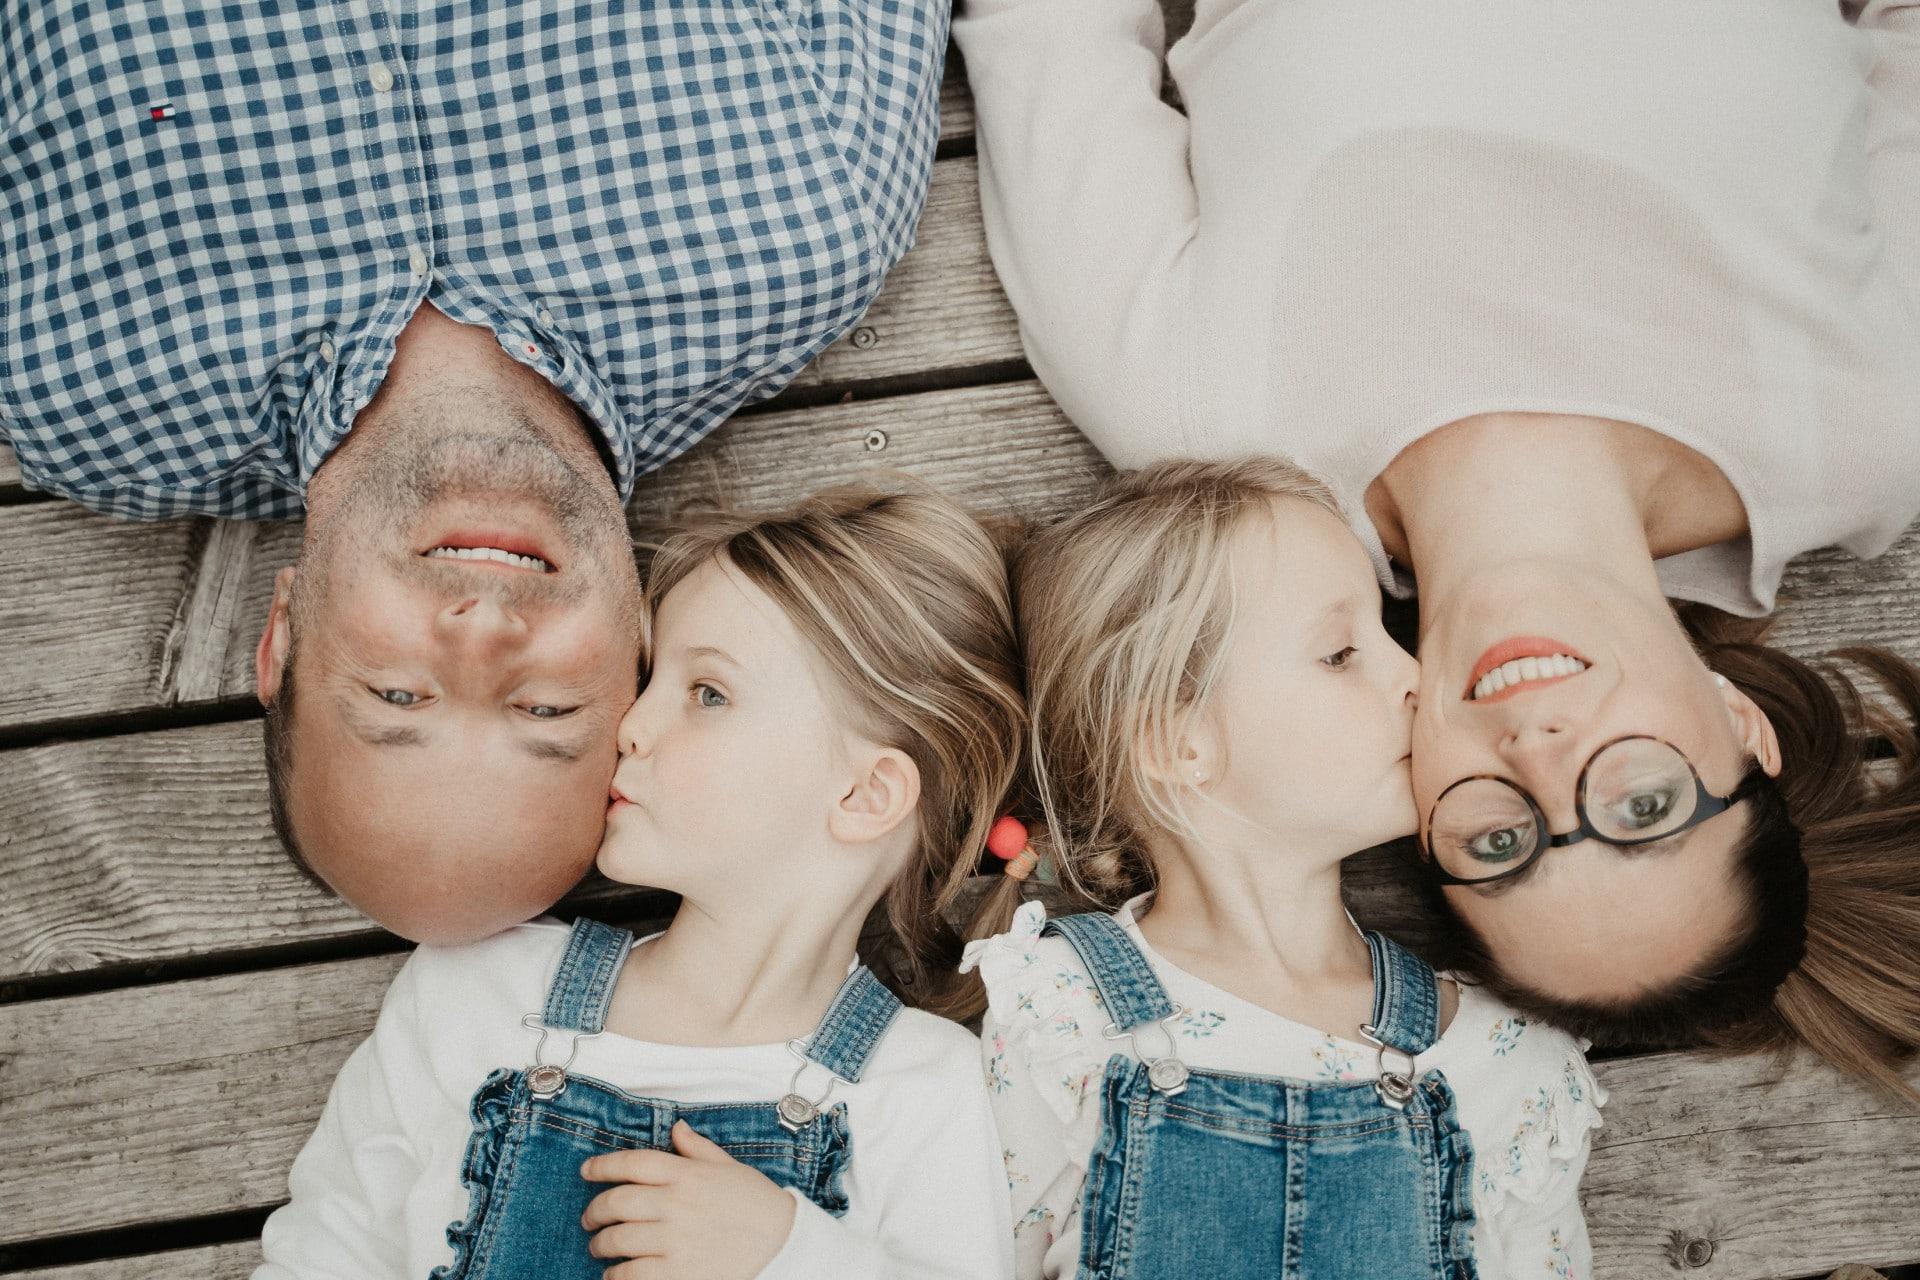 855-Fotostudio-BRENDEL-Familienfotos-V697yLrK